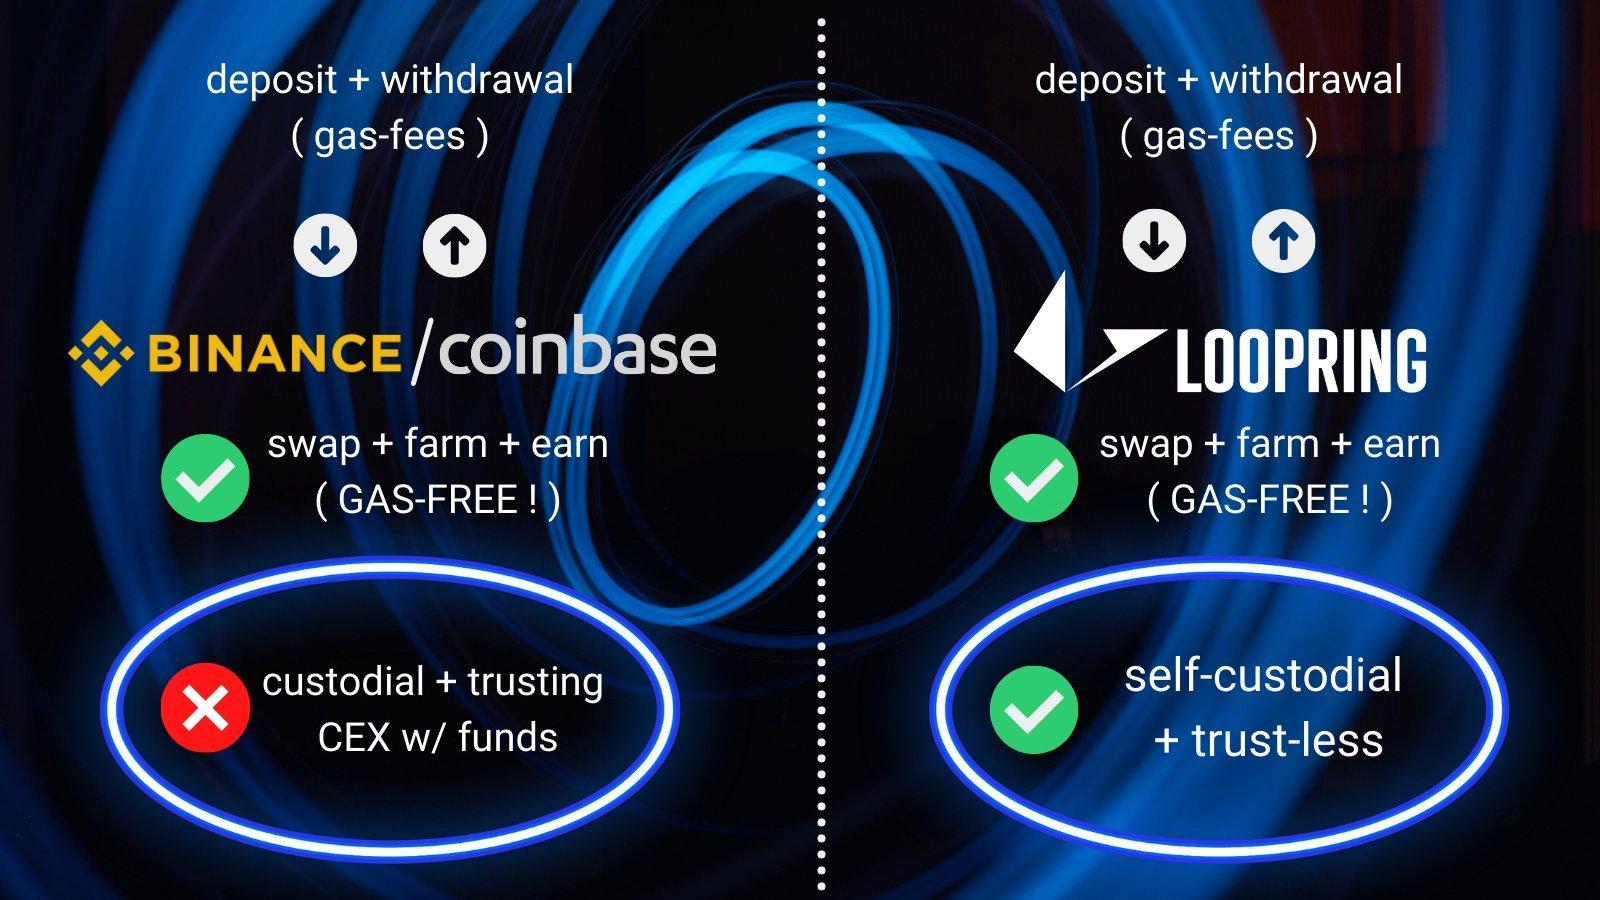 loopring comparison